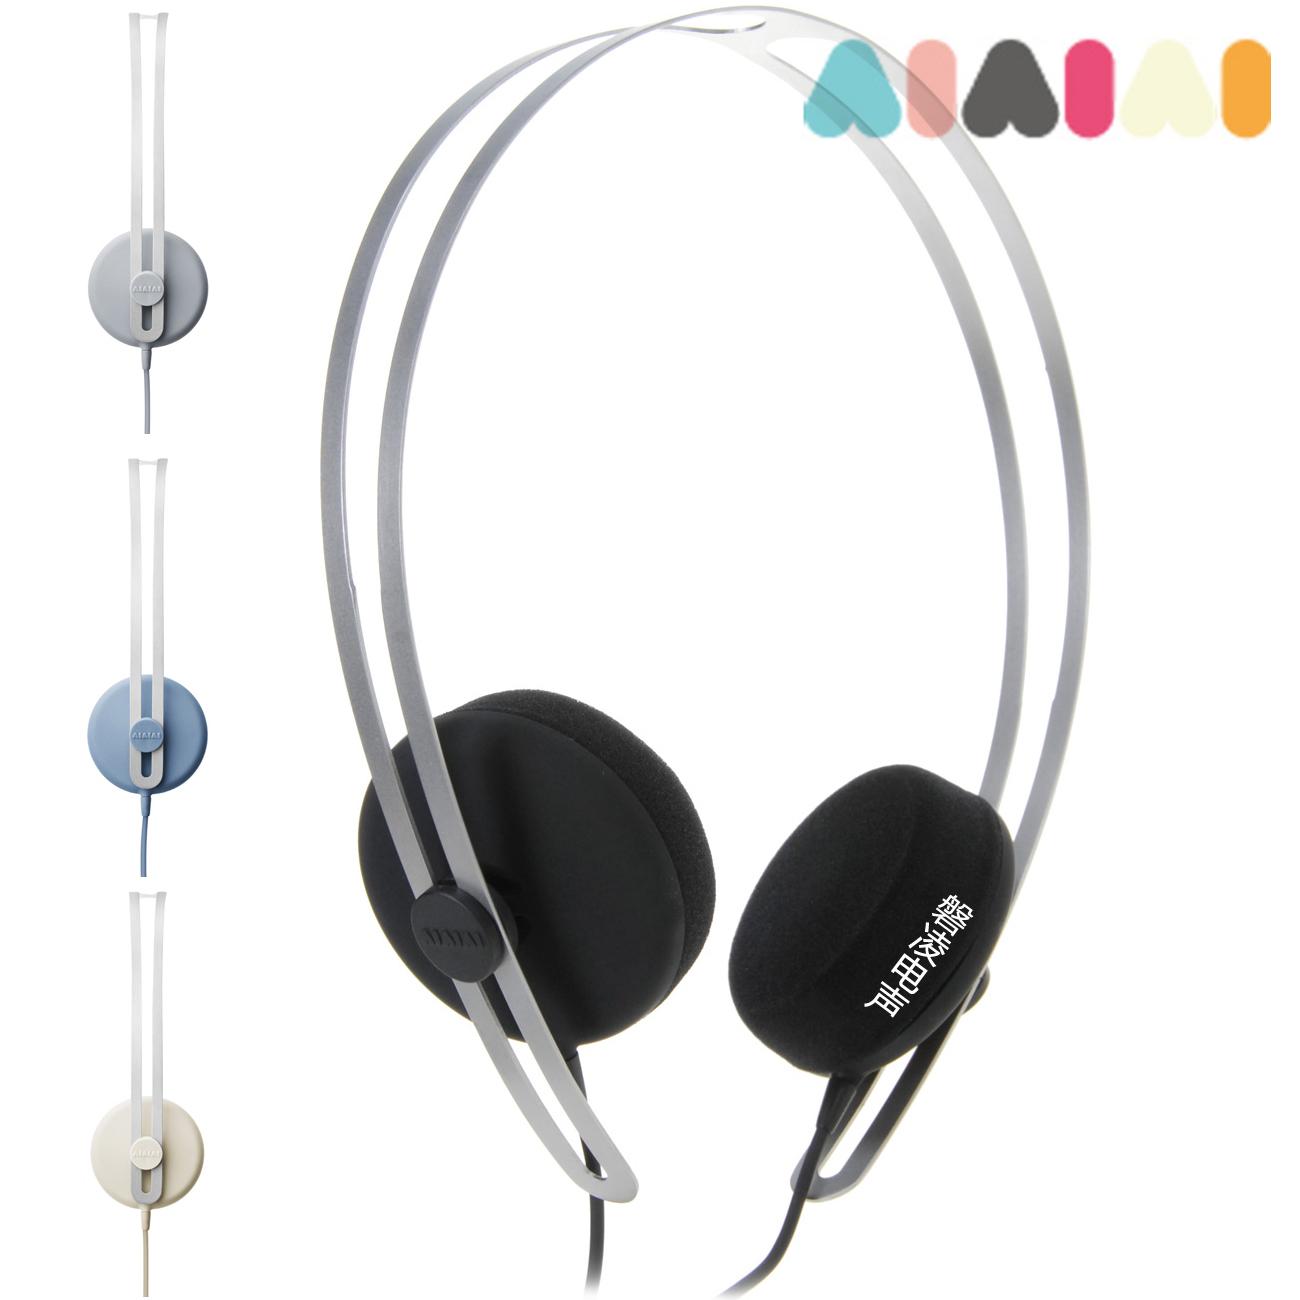 Aiaiai tracks music earphones button